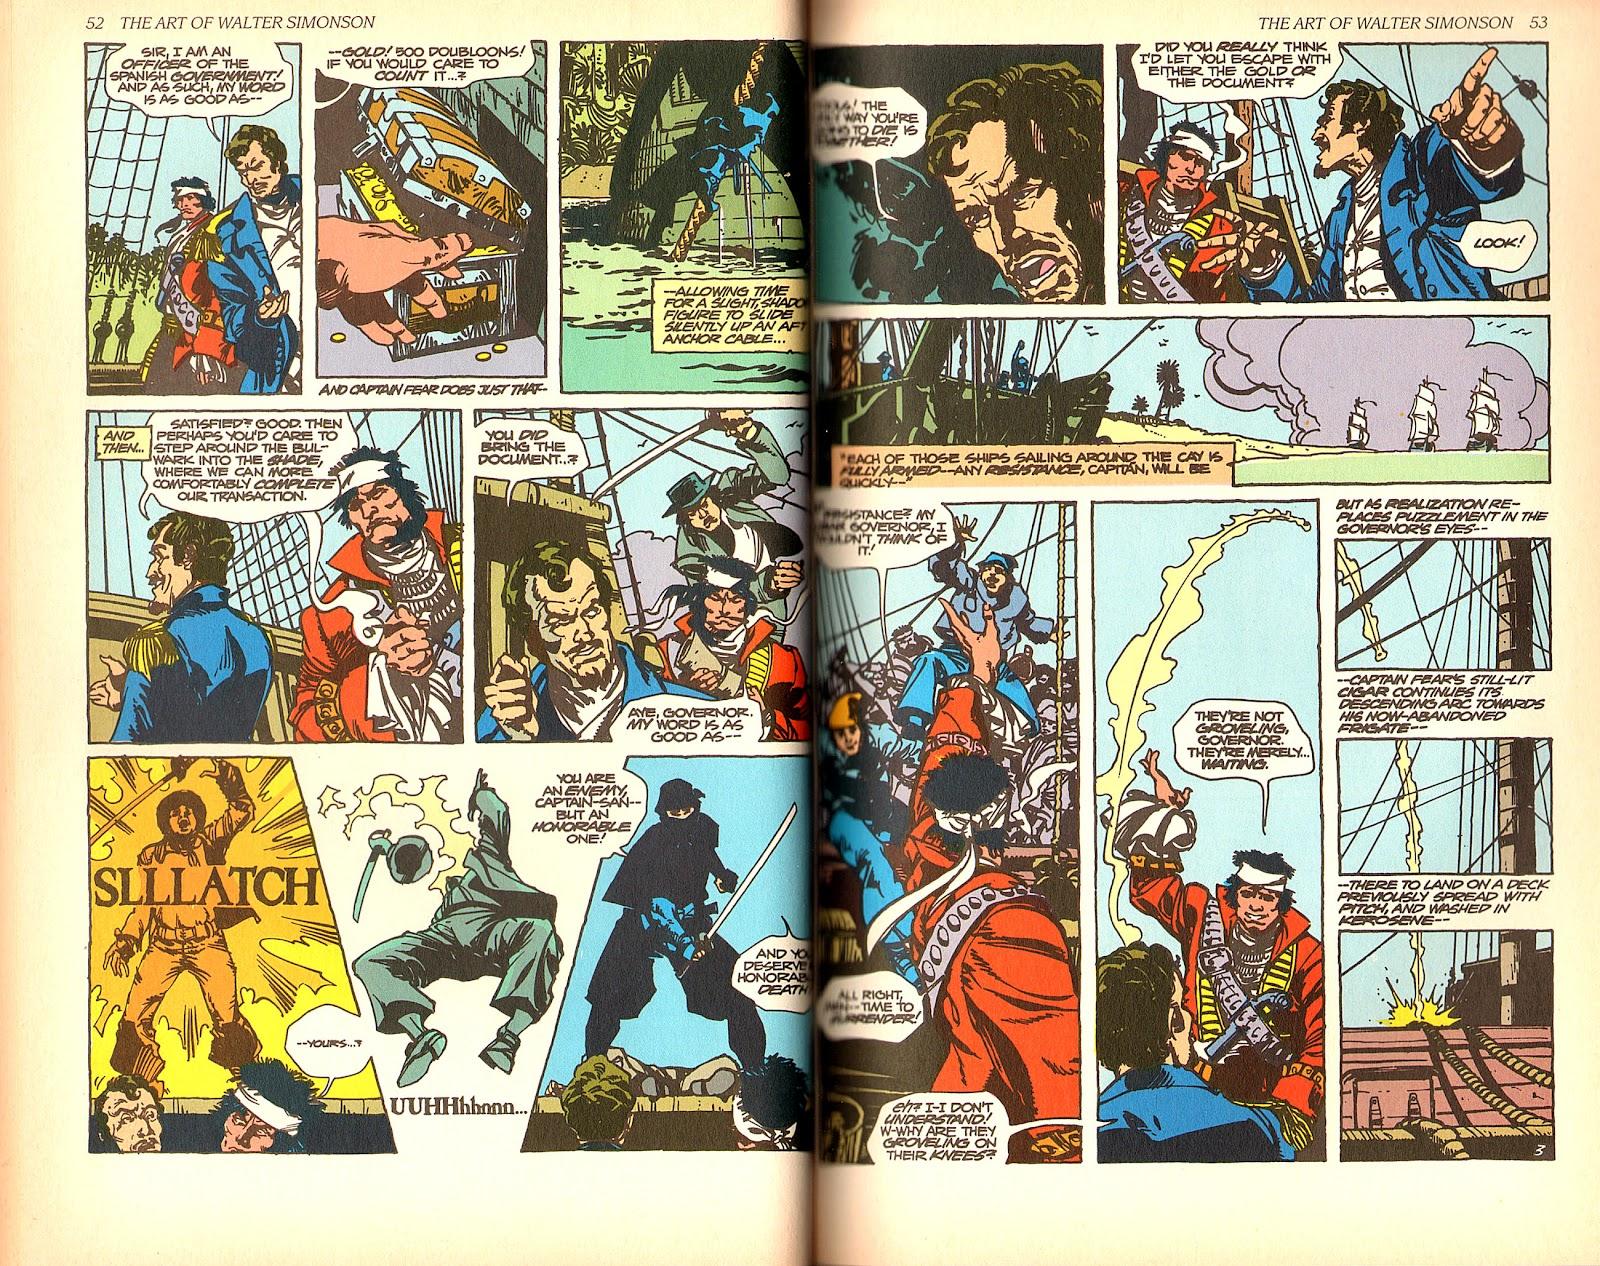 Read online The Art of Walter Simonson comic -  Issue # TPB - 28